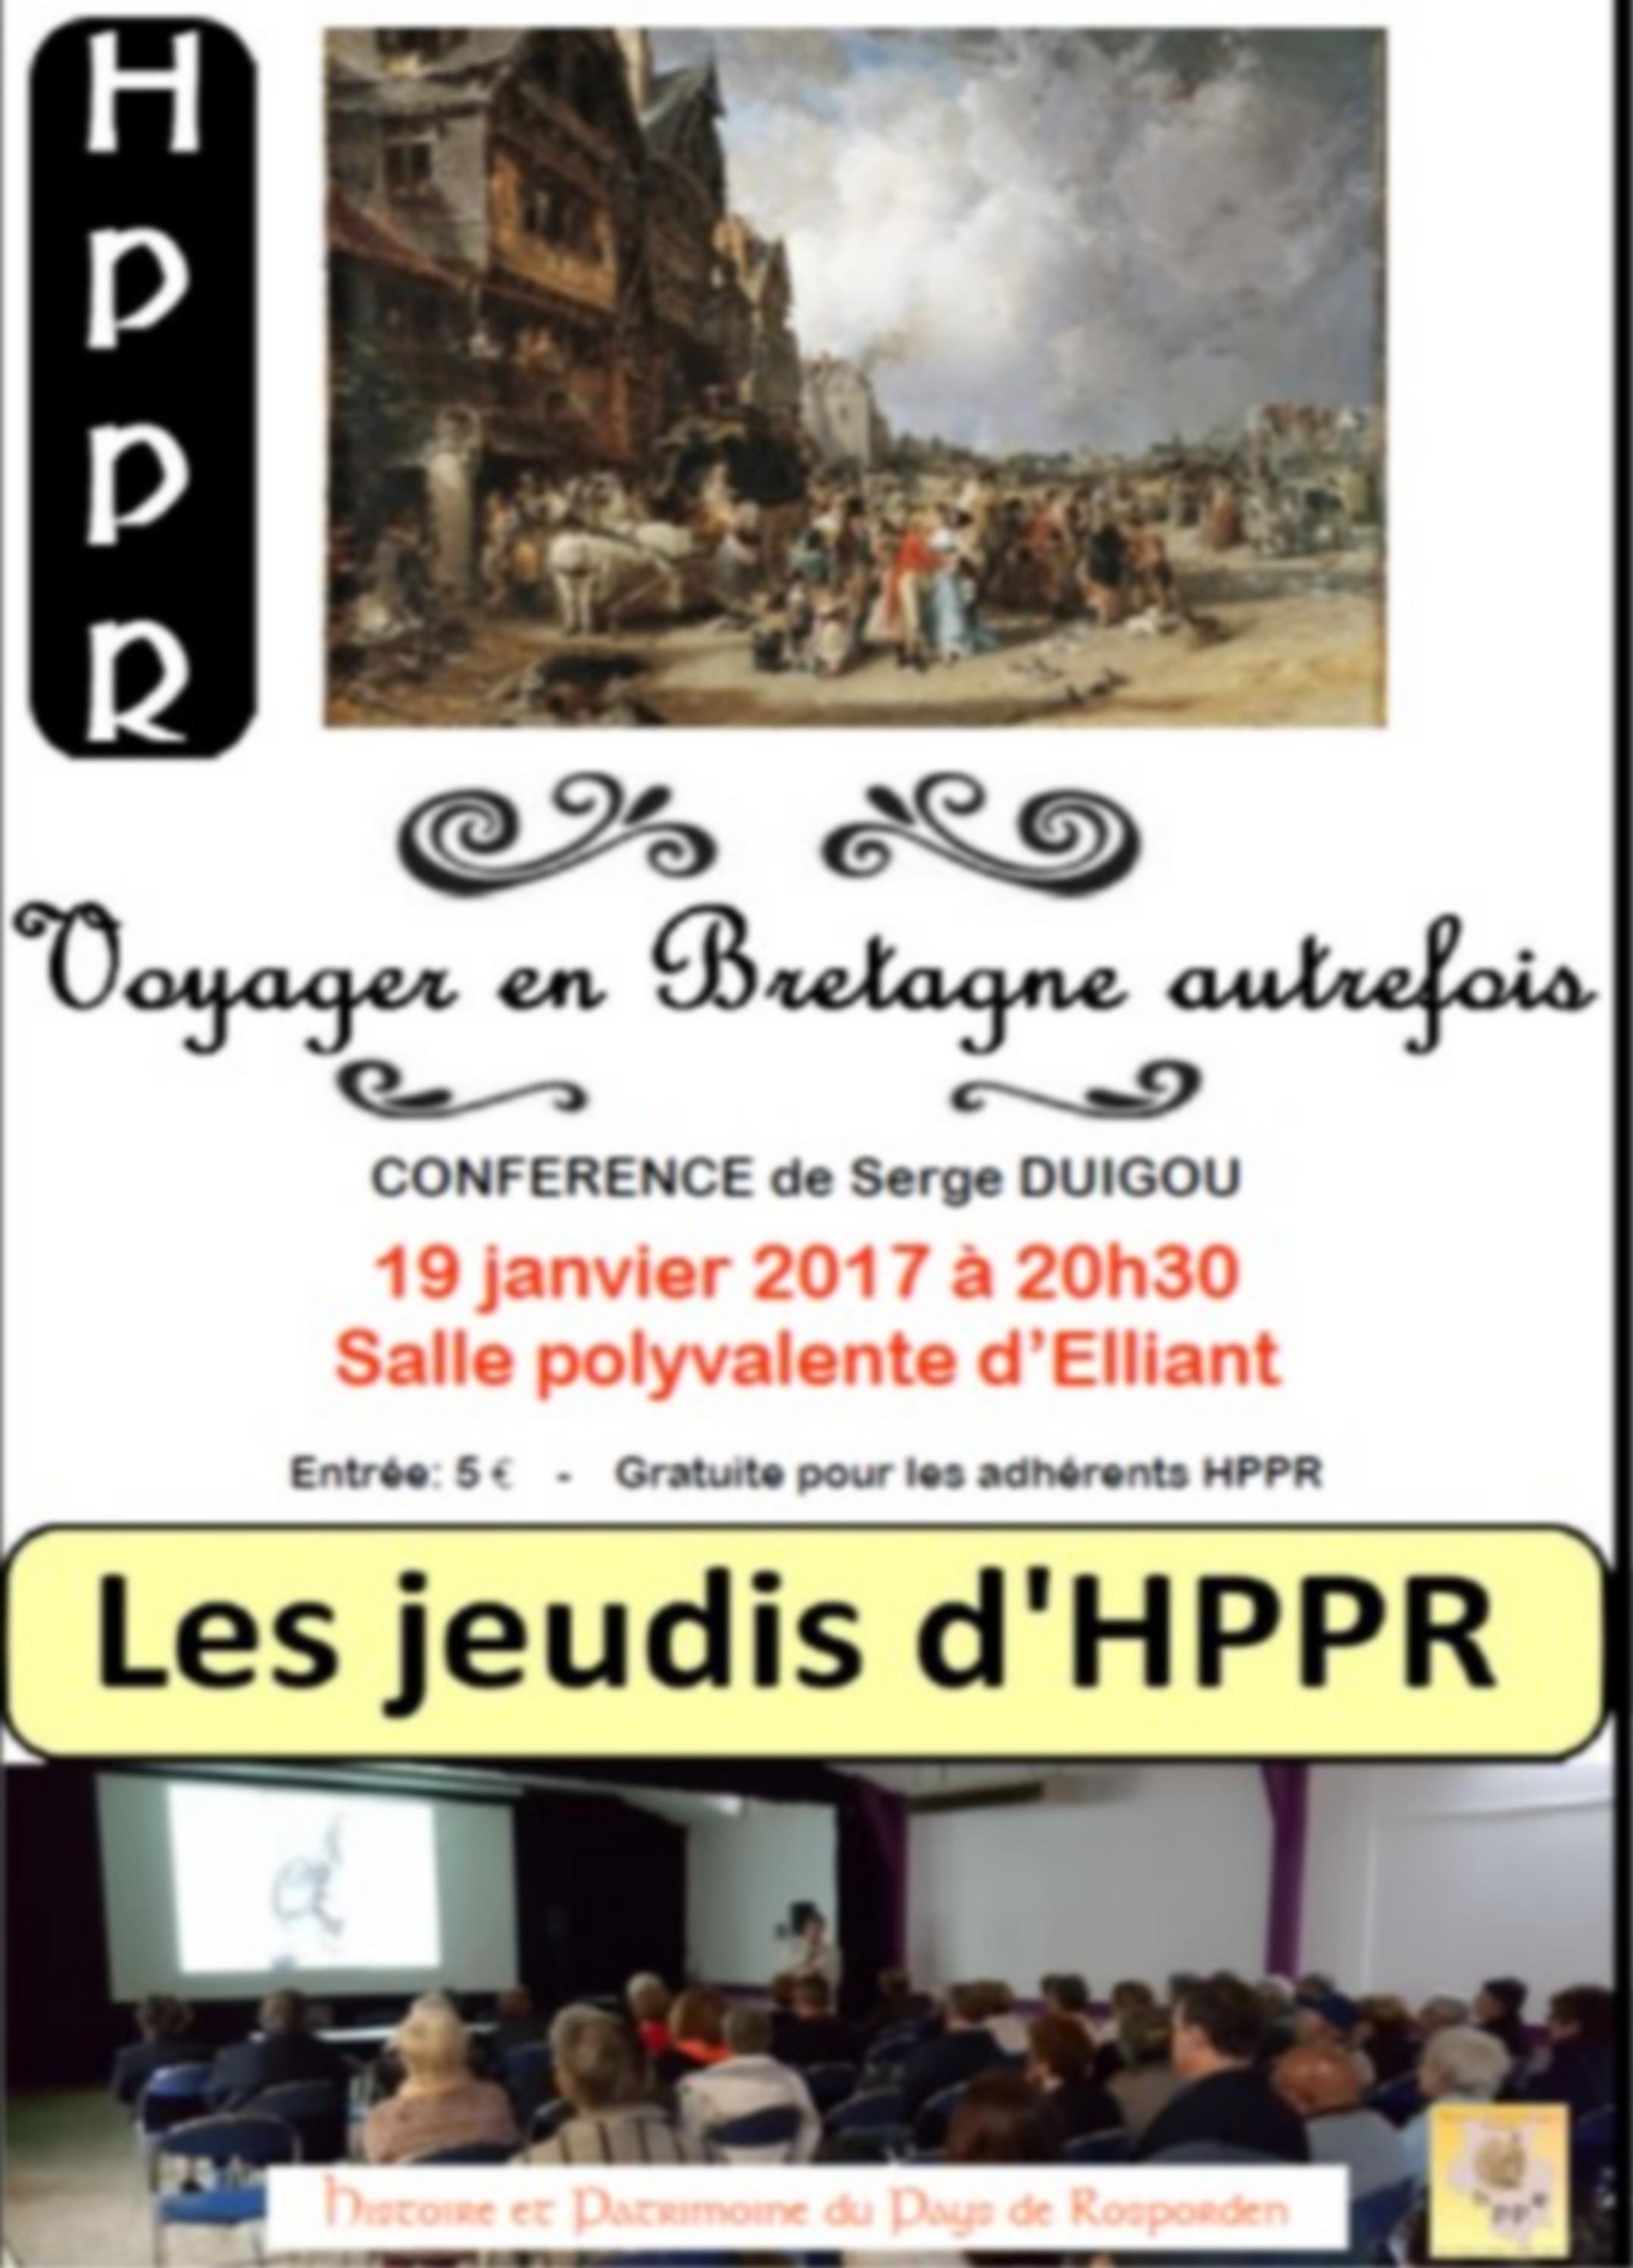 Serge DUIGOU : Voyager en Bretagne